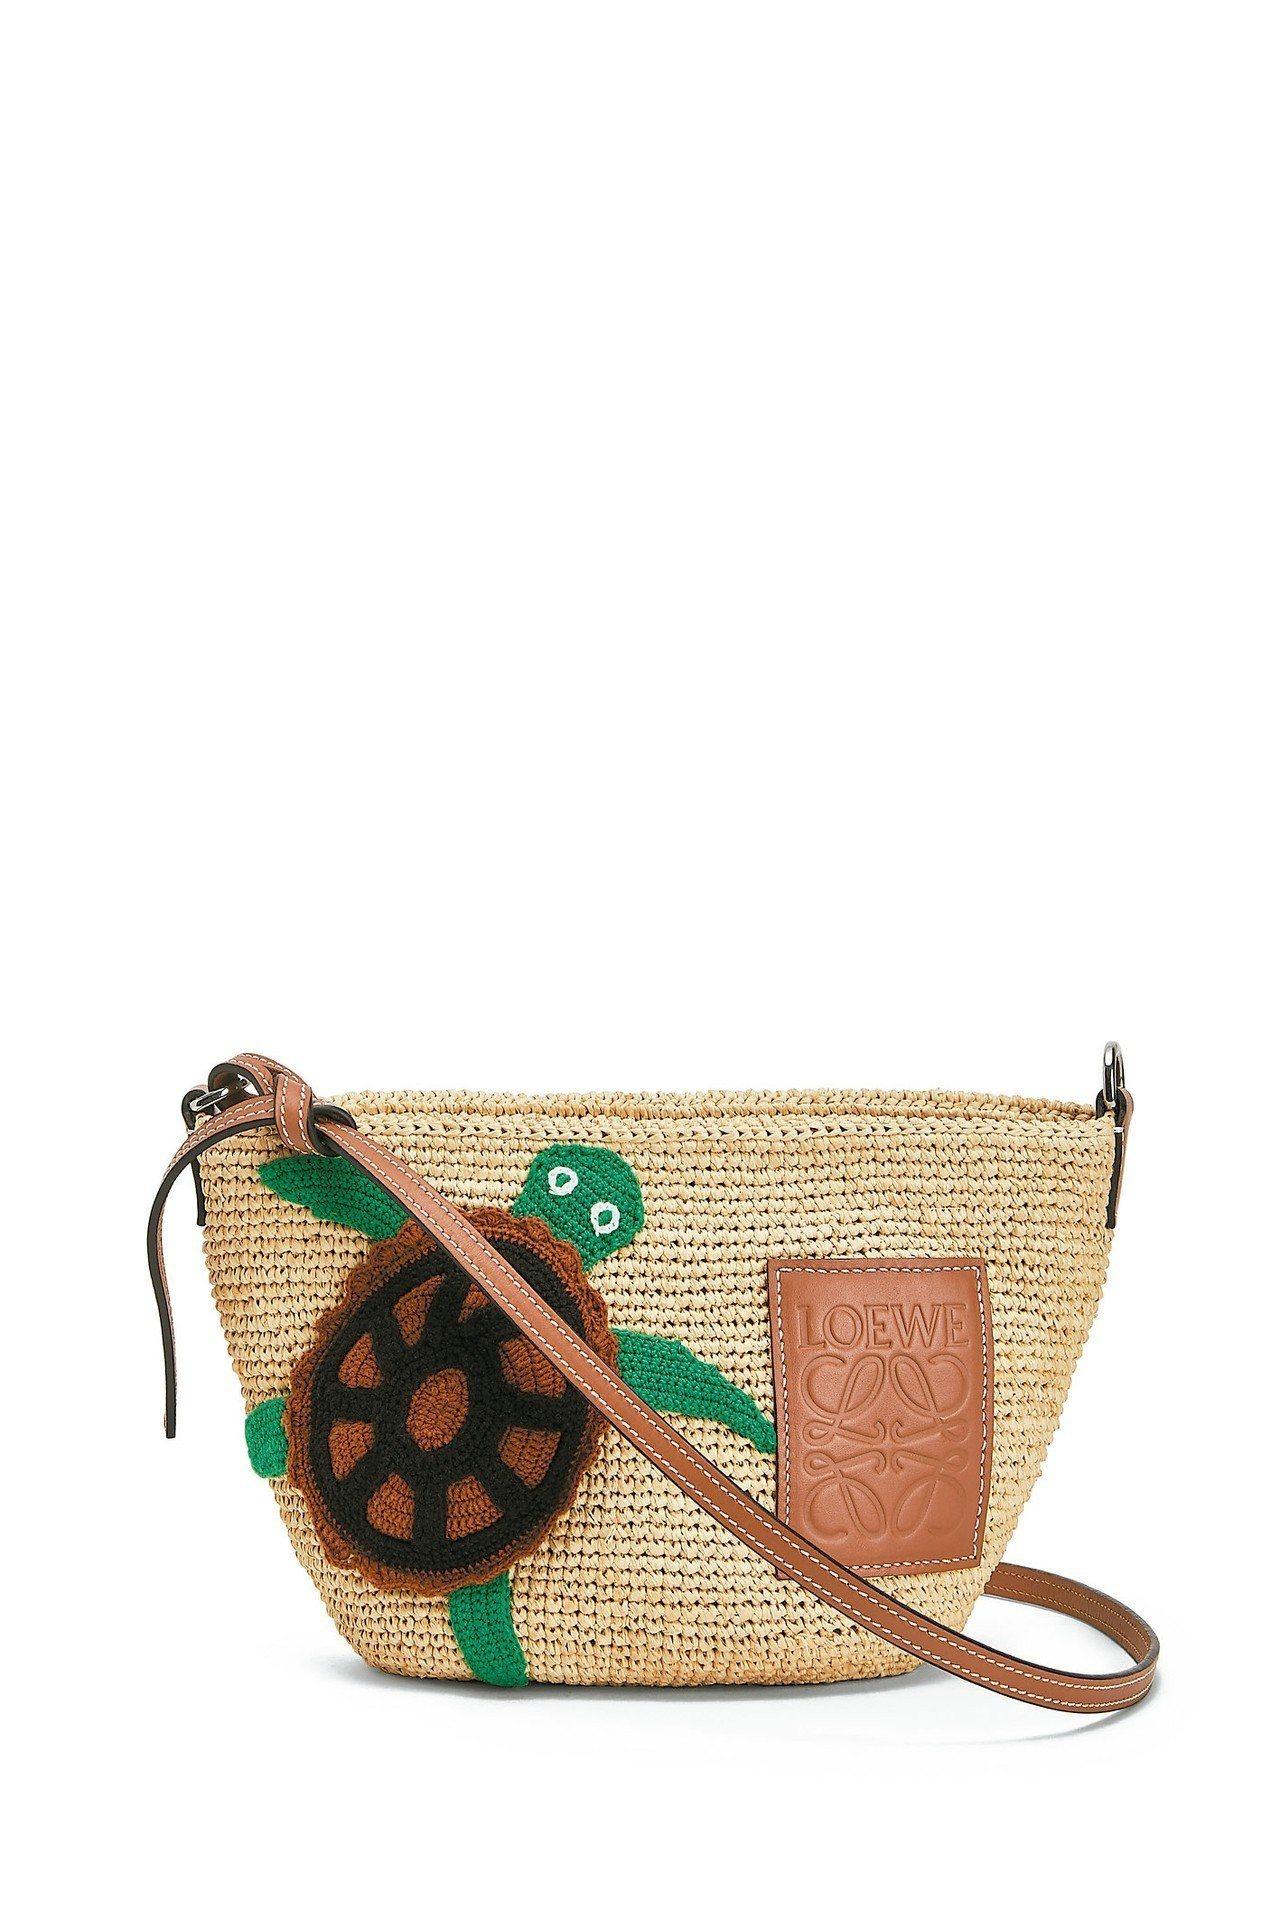 LOEWE小海龜酒椰葉編織提包,價格店洽。 圖/LOEWE提供